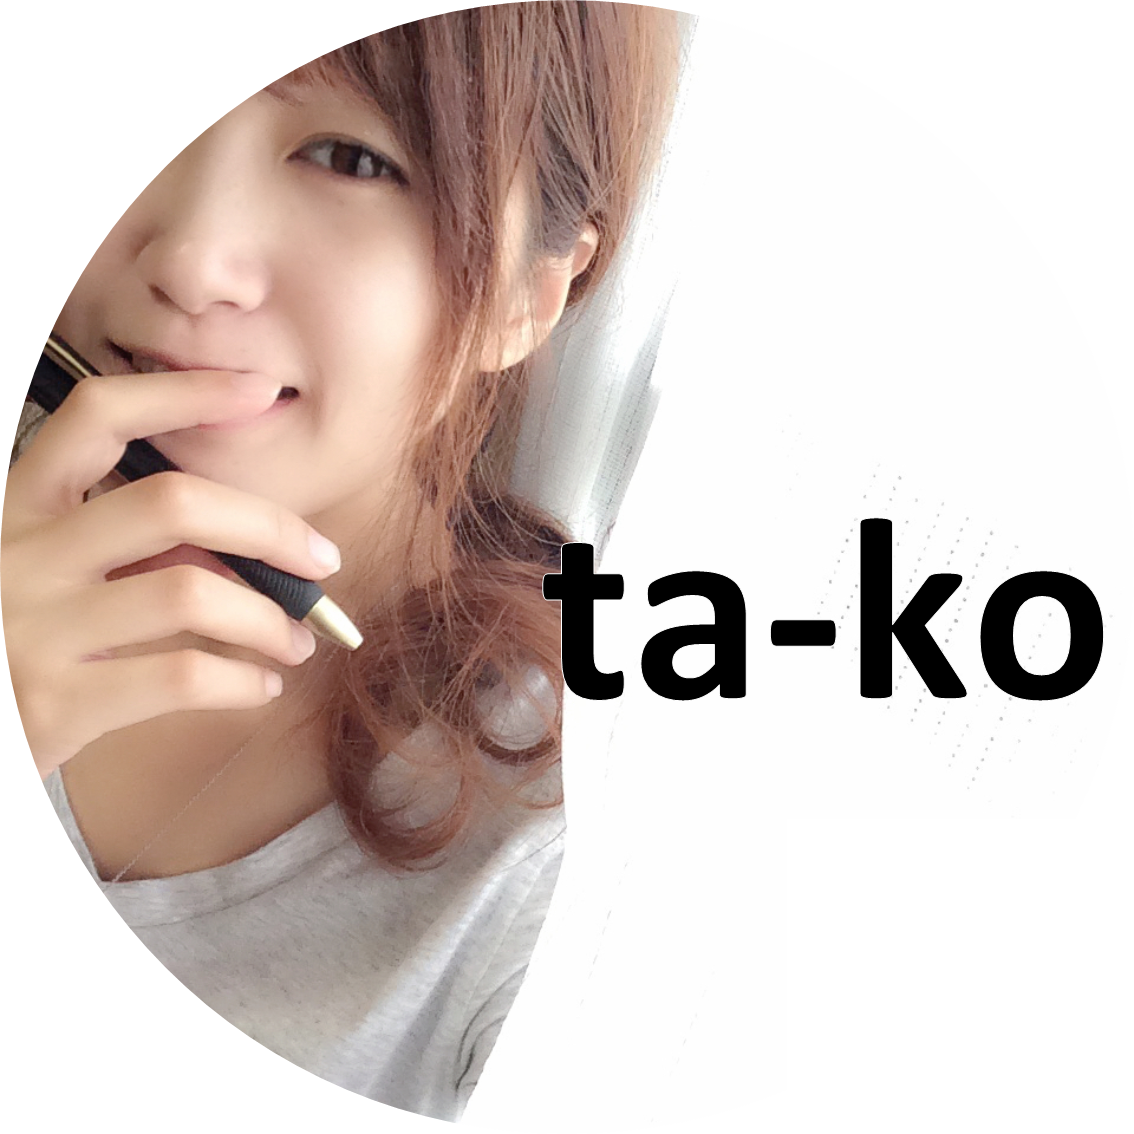 ta-ko.png